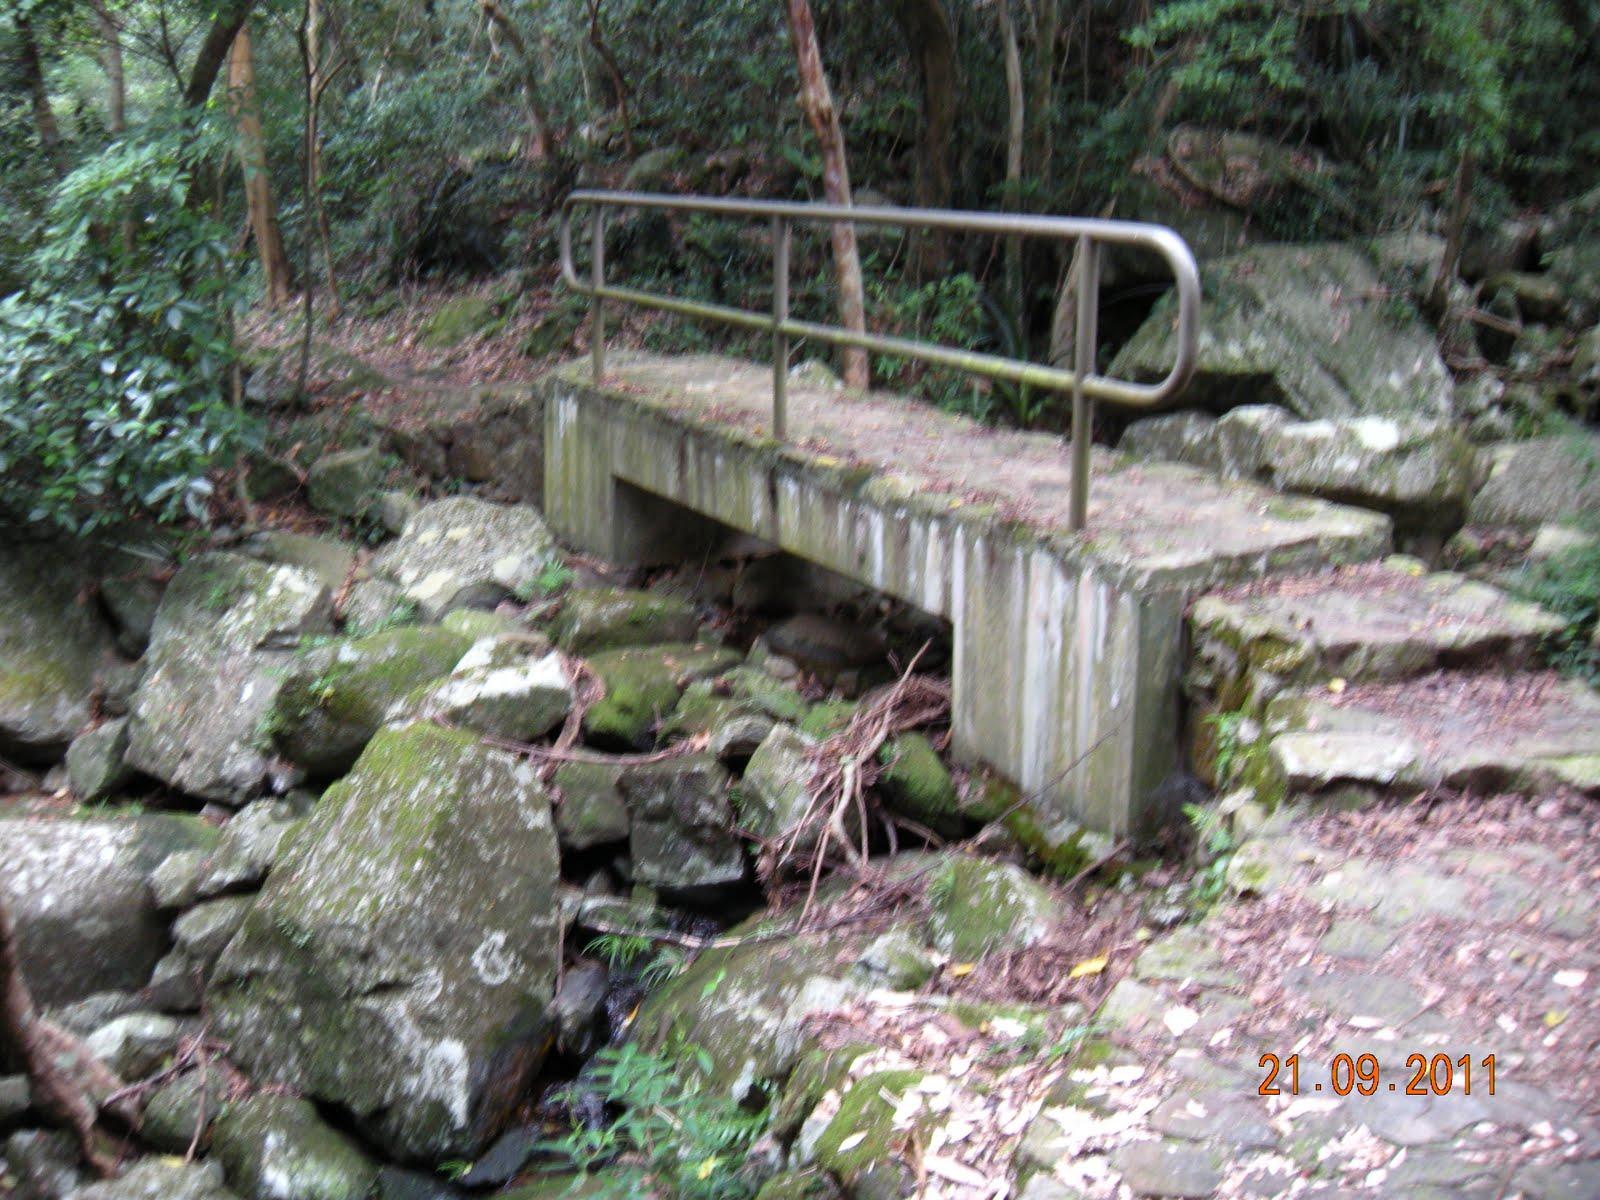 HK Hiking @旅遊樂悠悠.com: 馬鞍山郊野公園:黃泥頭→梅子林→茅坪→梅子林村→ 富安花園